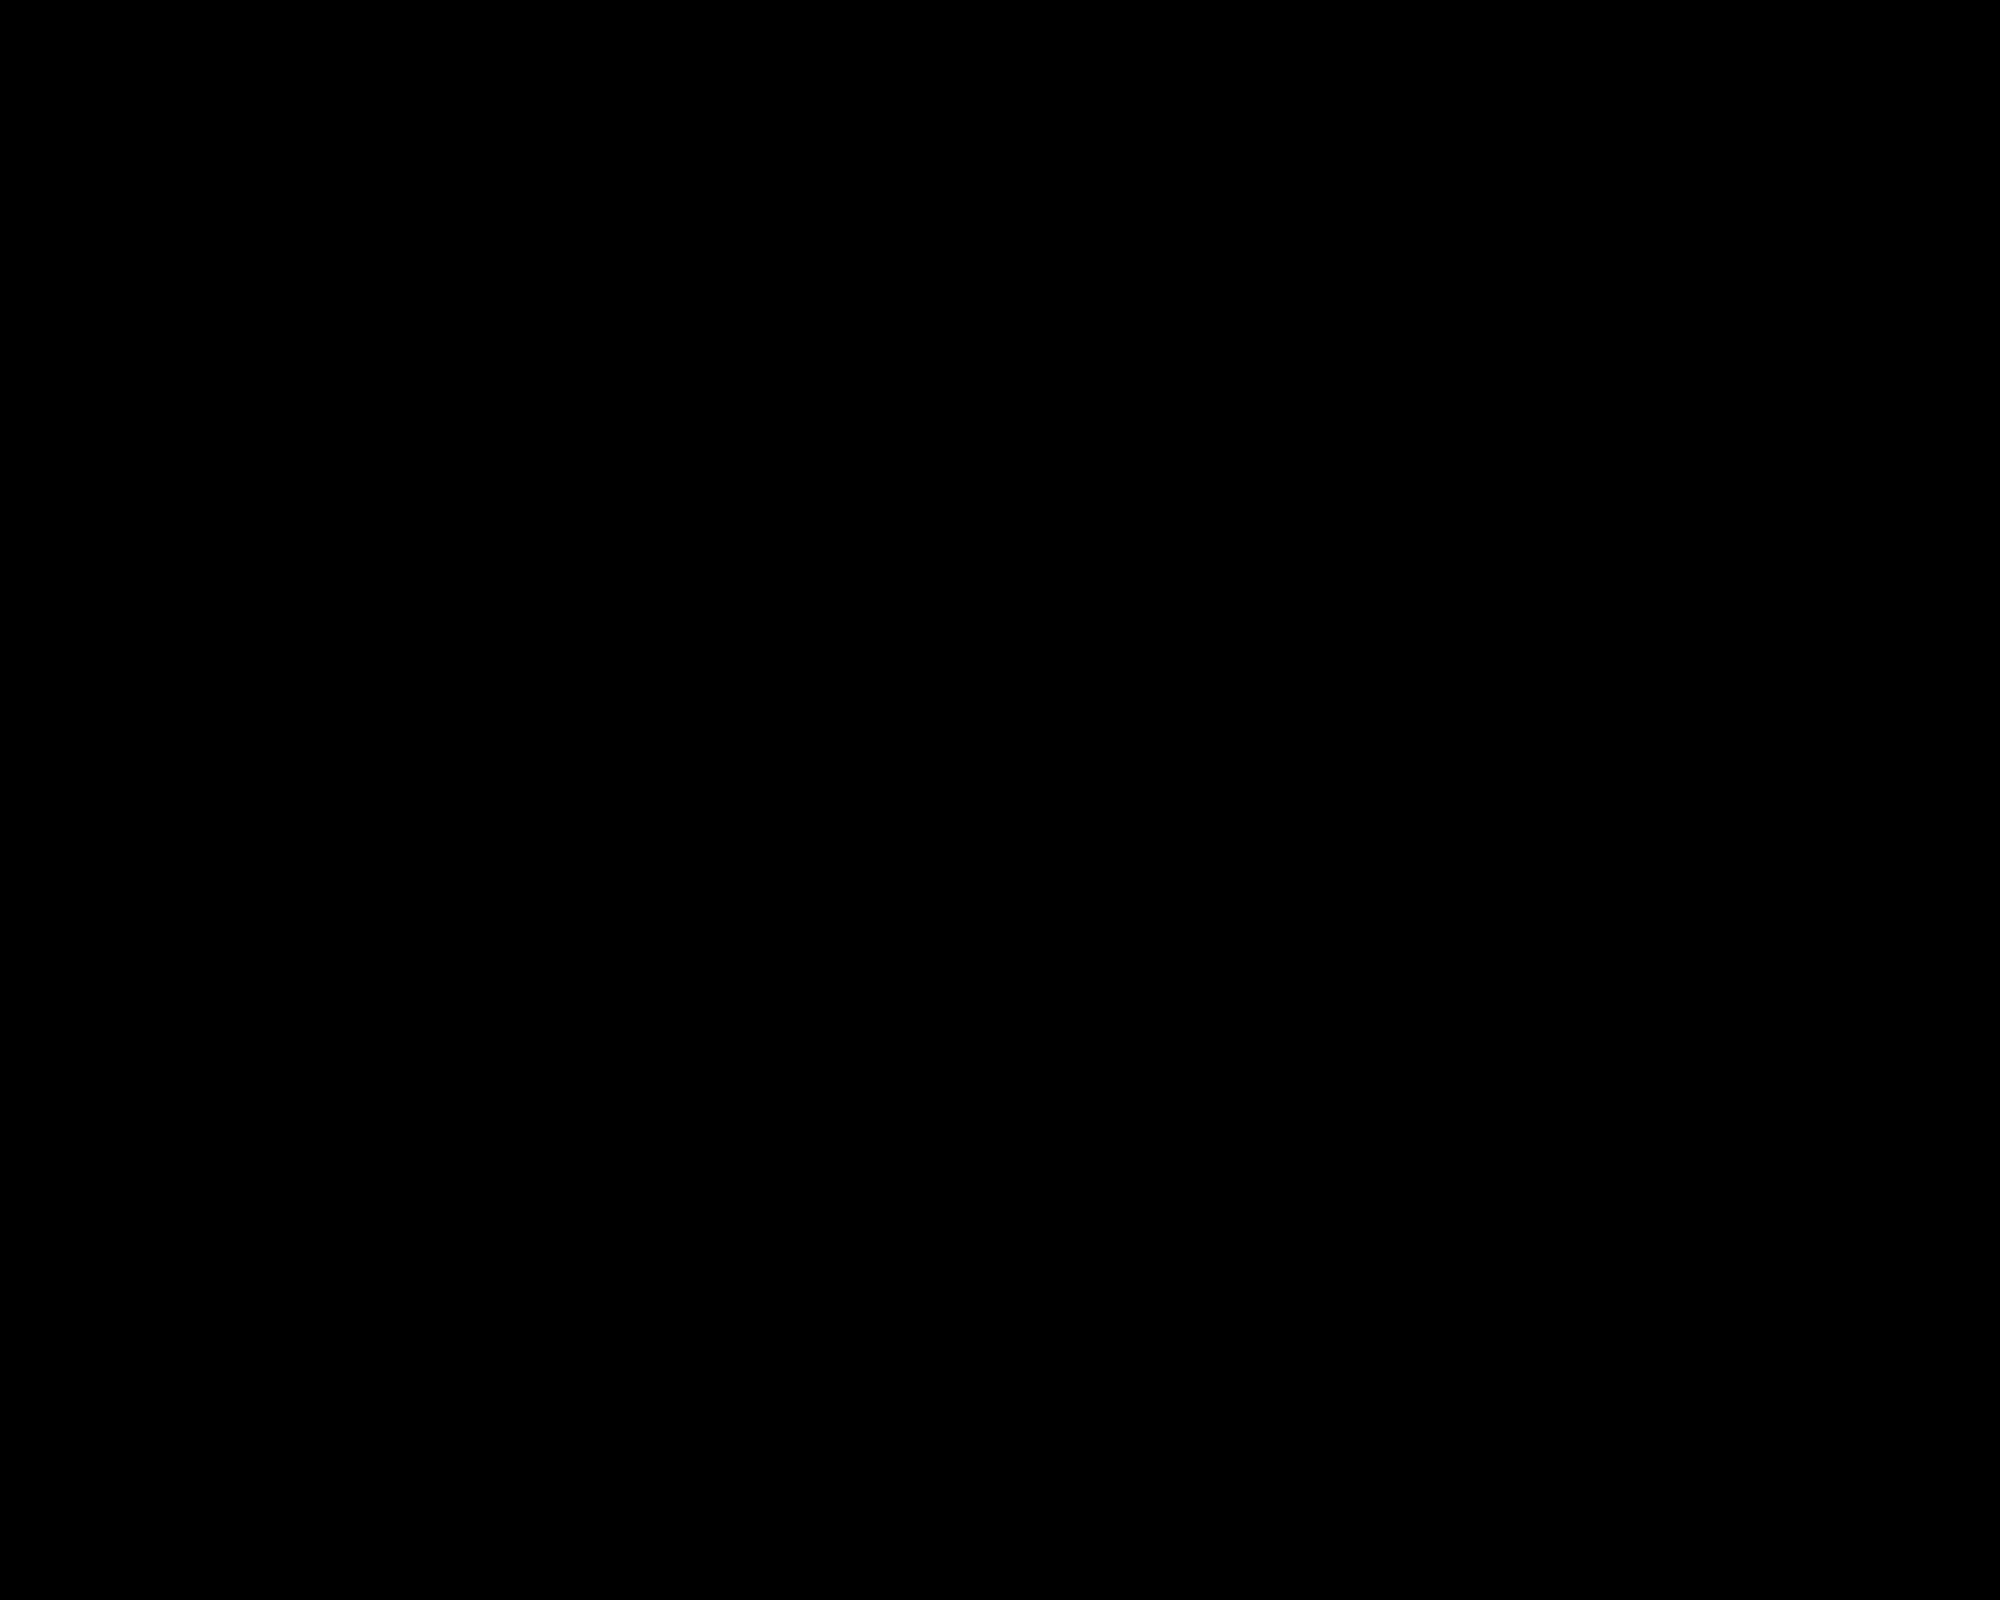 File icon svg wikimedia. Luggage clipart opened suitcase